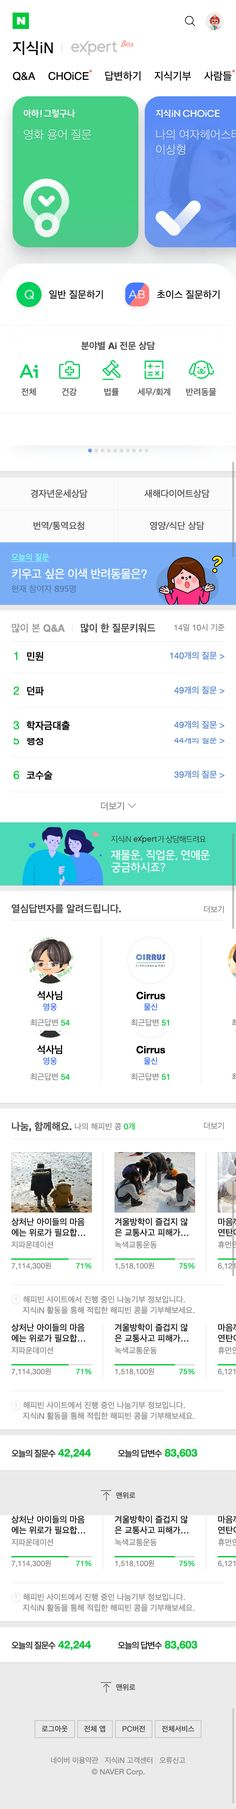 Mobile Design, App Design, Email Application, E Signature, Free Icon Fonts, Korean Design, Email Signatures, Email Client, Social Icons